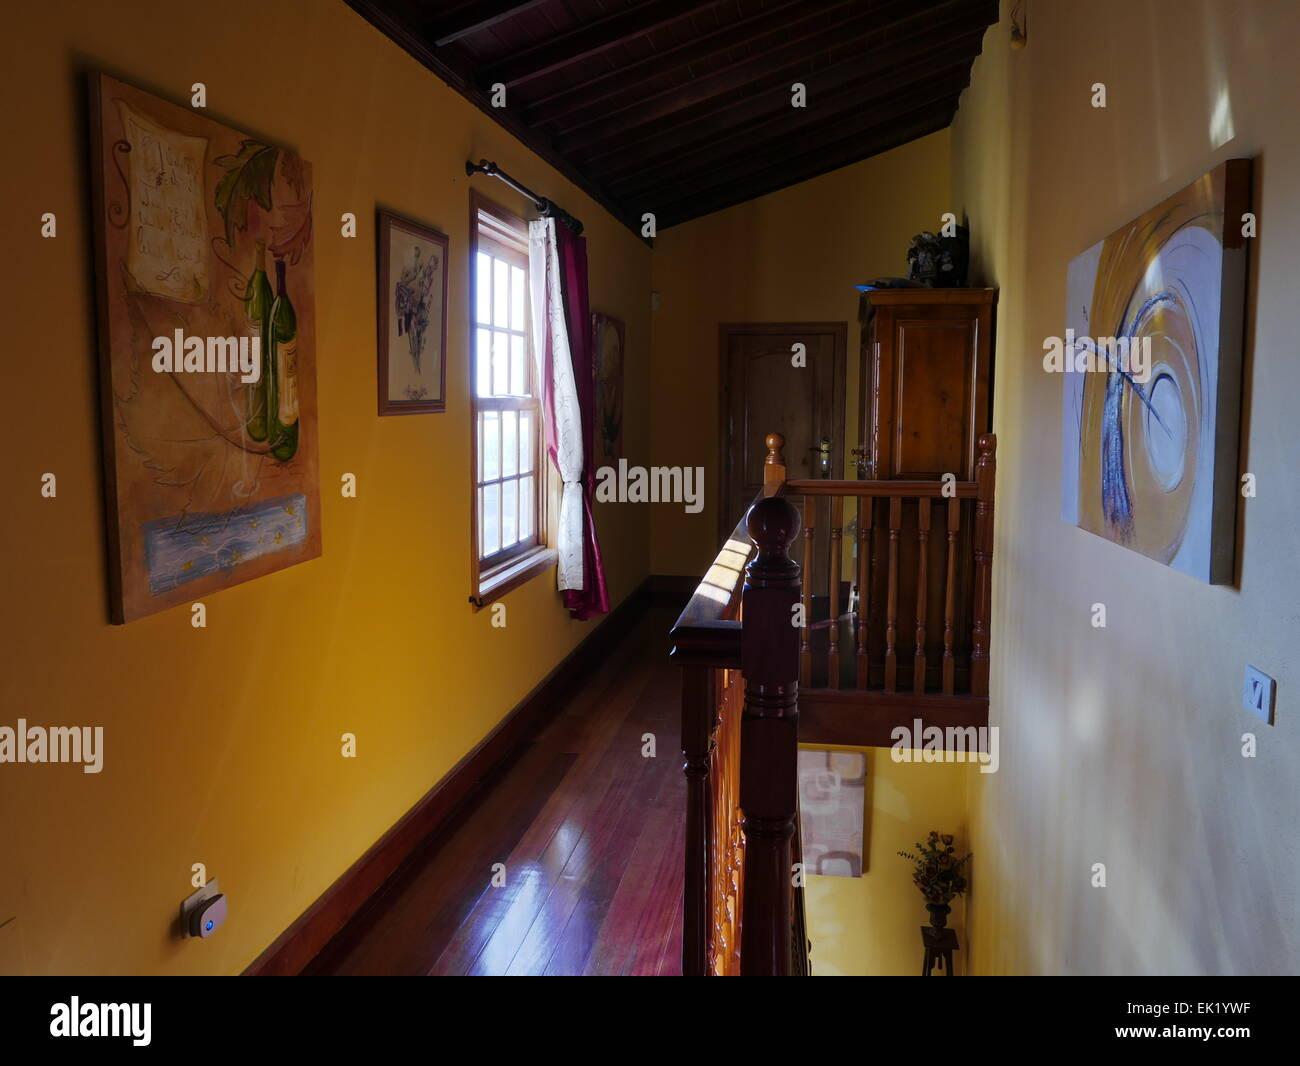 Spanien-Kanarische Inseln-Teneriffa Vilaflor Interieur Stockbild